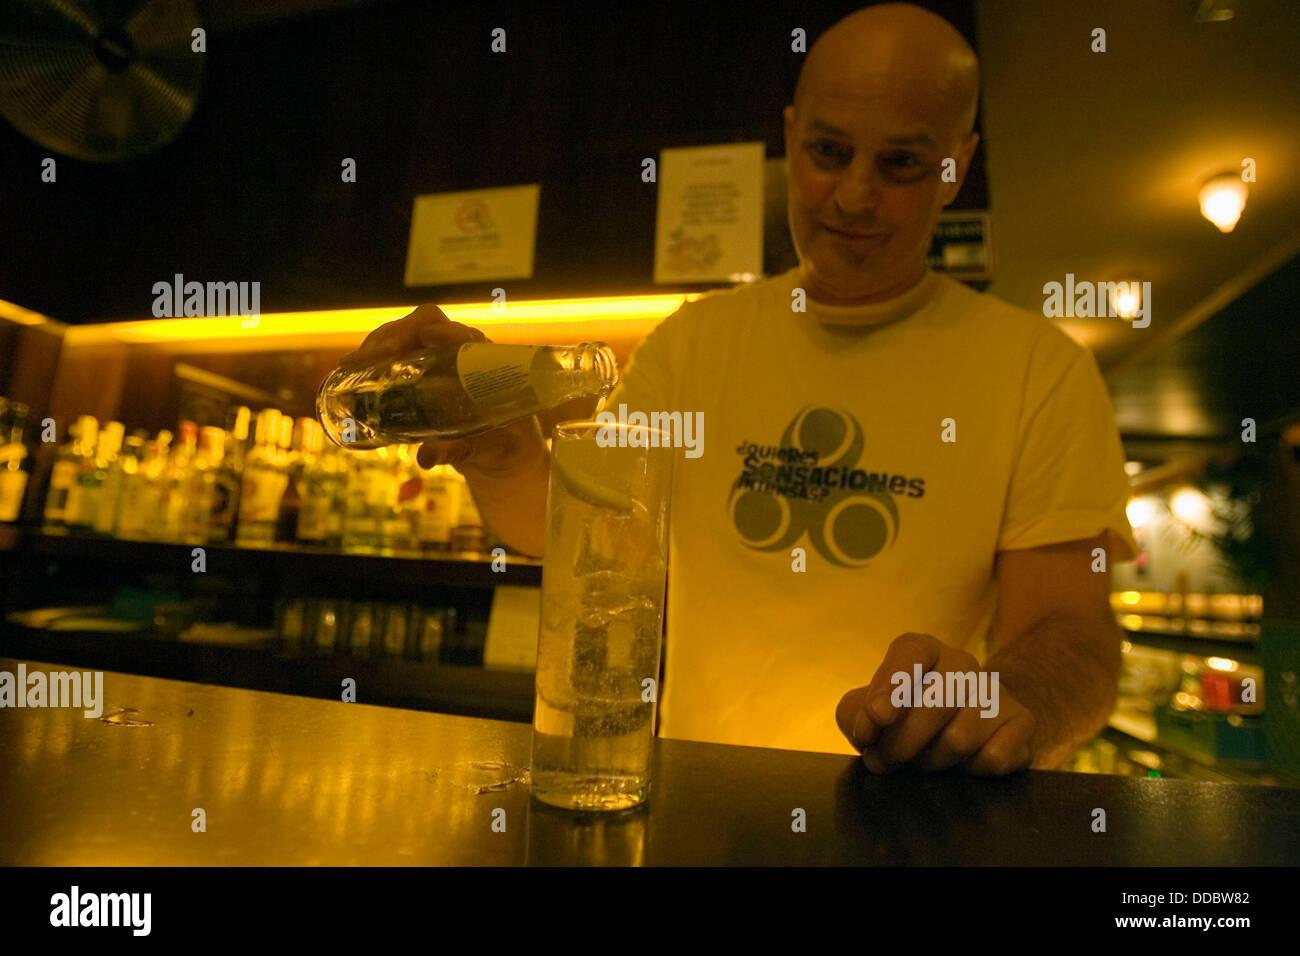 Dietrich Café, gay bar. Consell de Cent 255, Barcelona, Spain - Stock Image